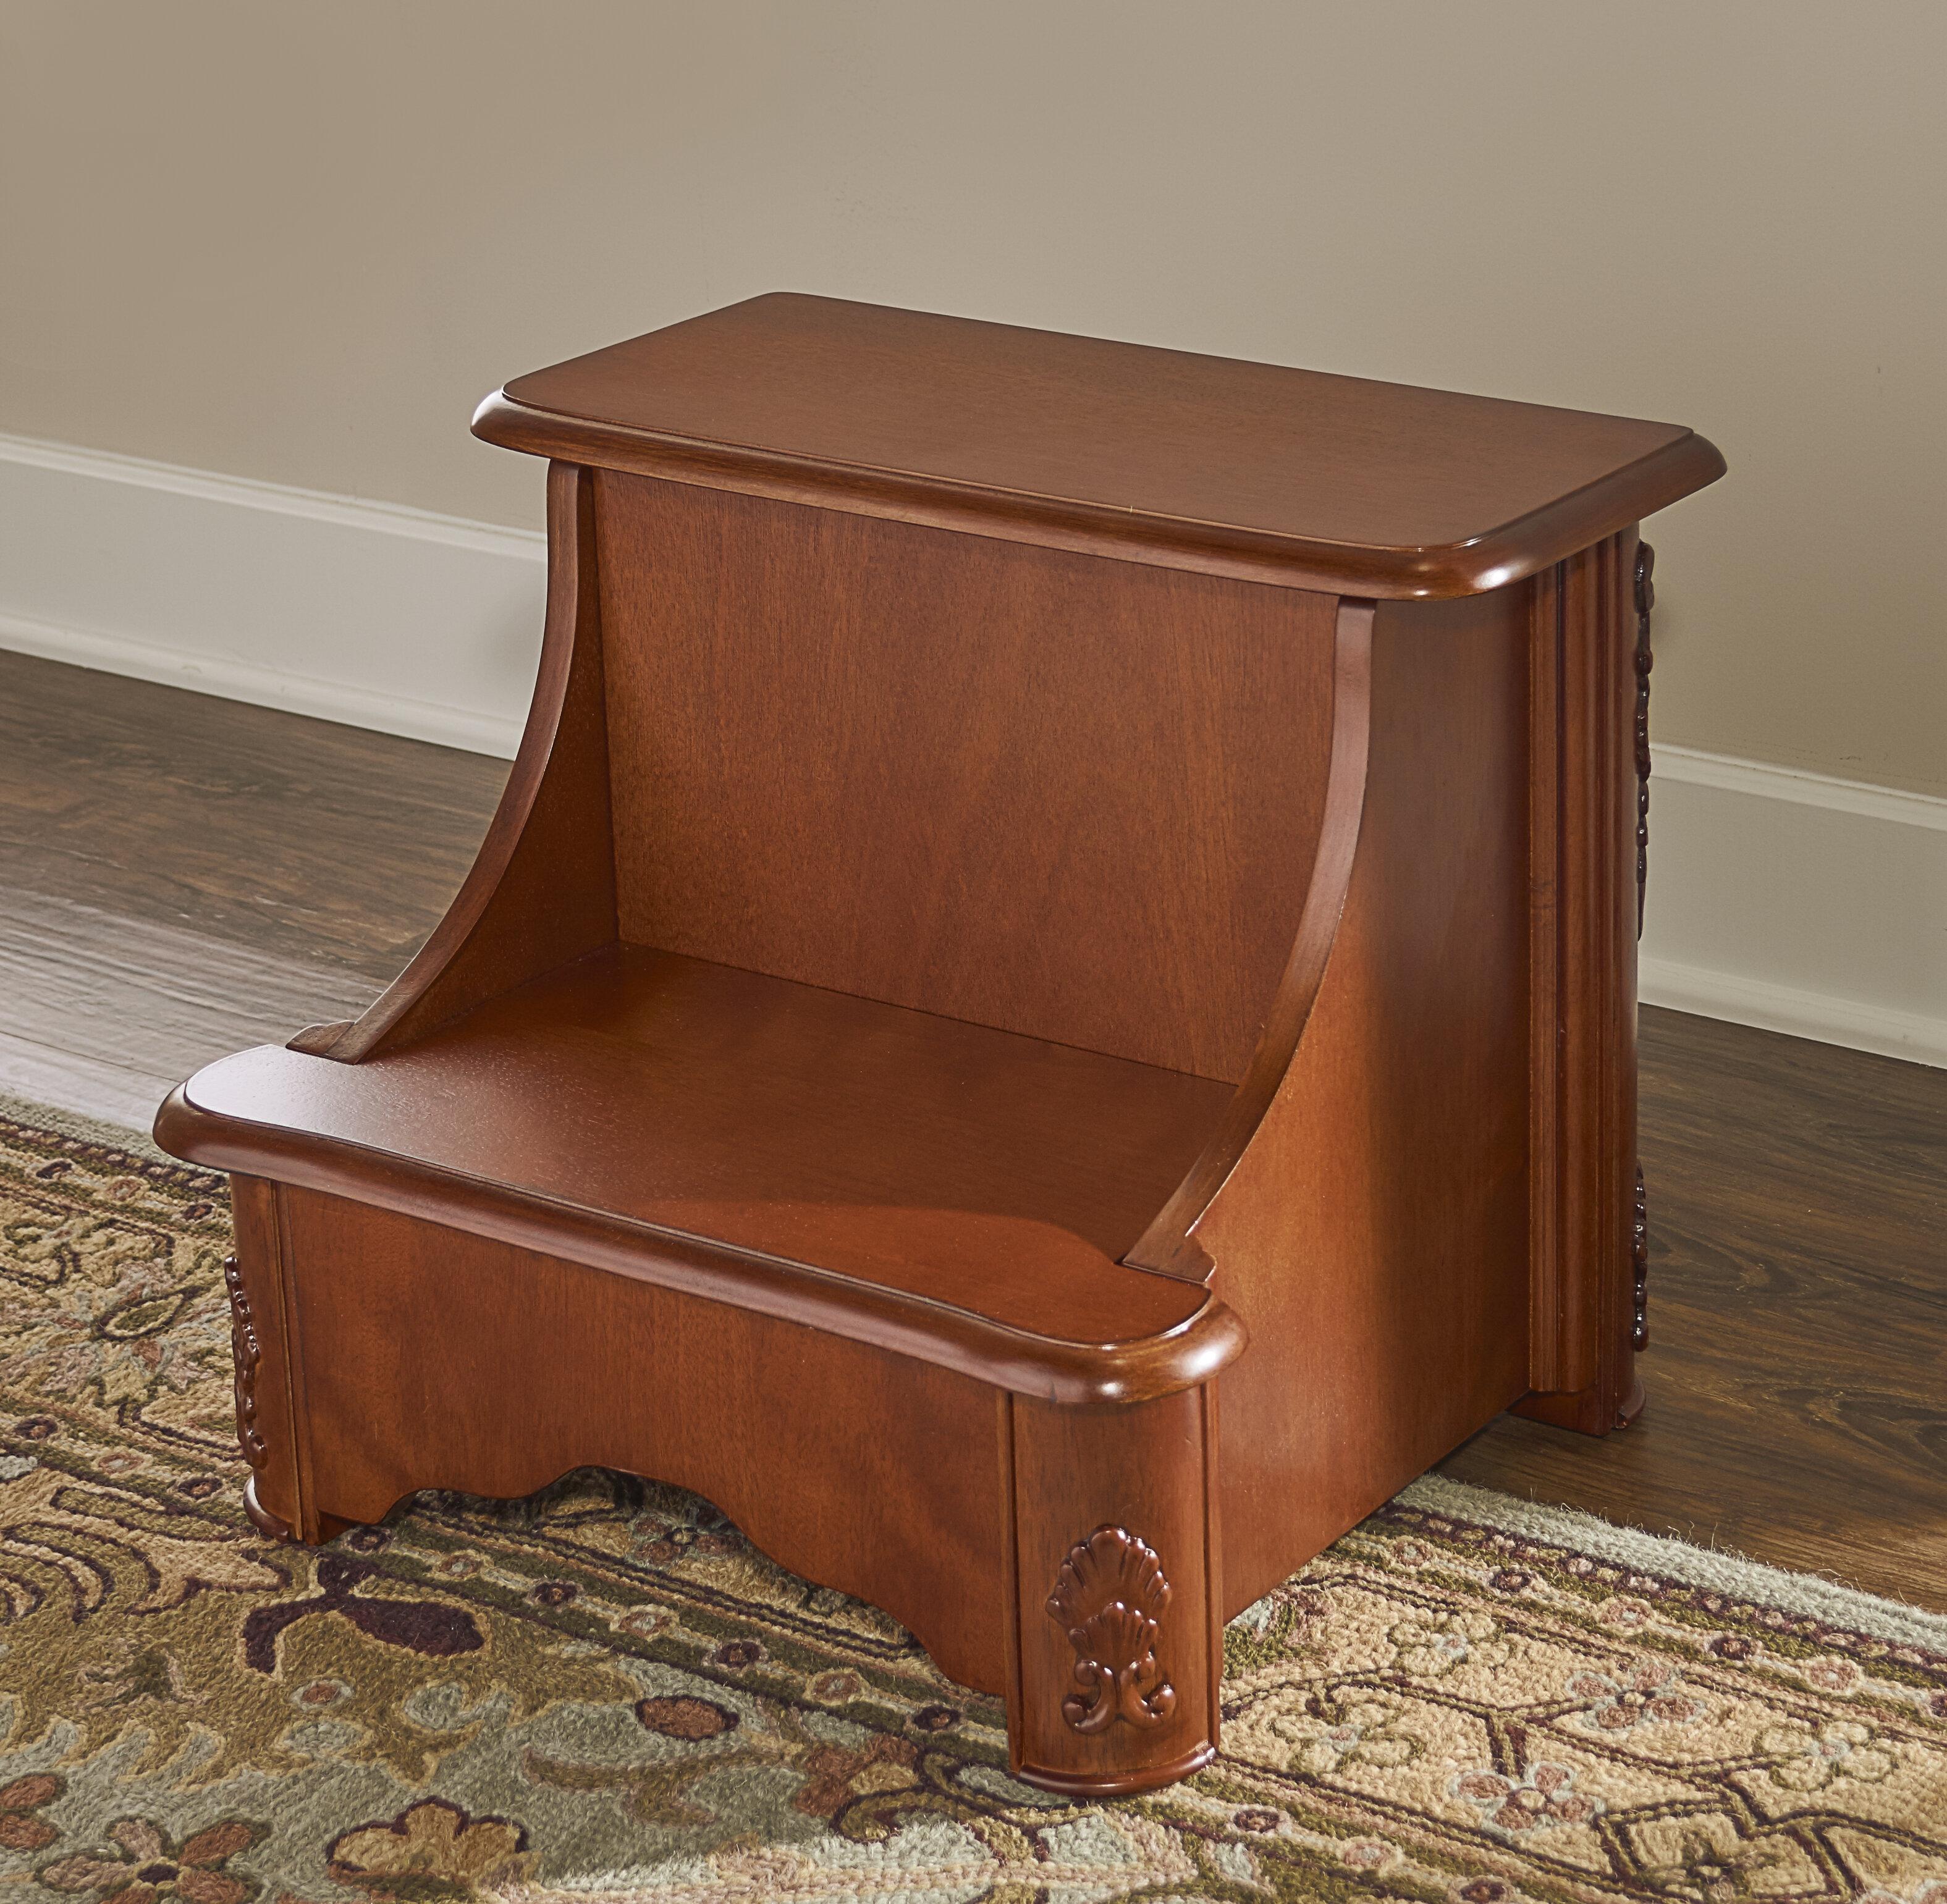 Bon Powell Woodbury Mahogany 2 Step Manufactured Wood Bed Step Stool With 200  Lb. Load Capacity U0026 Reviews   Wayfair